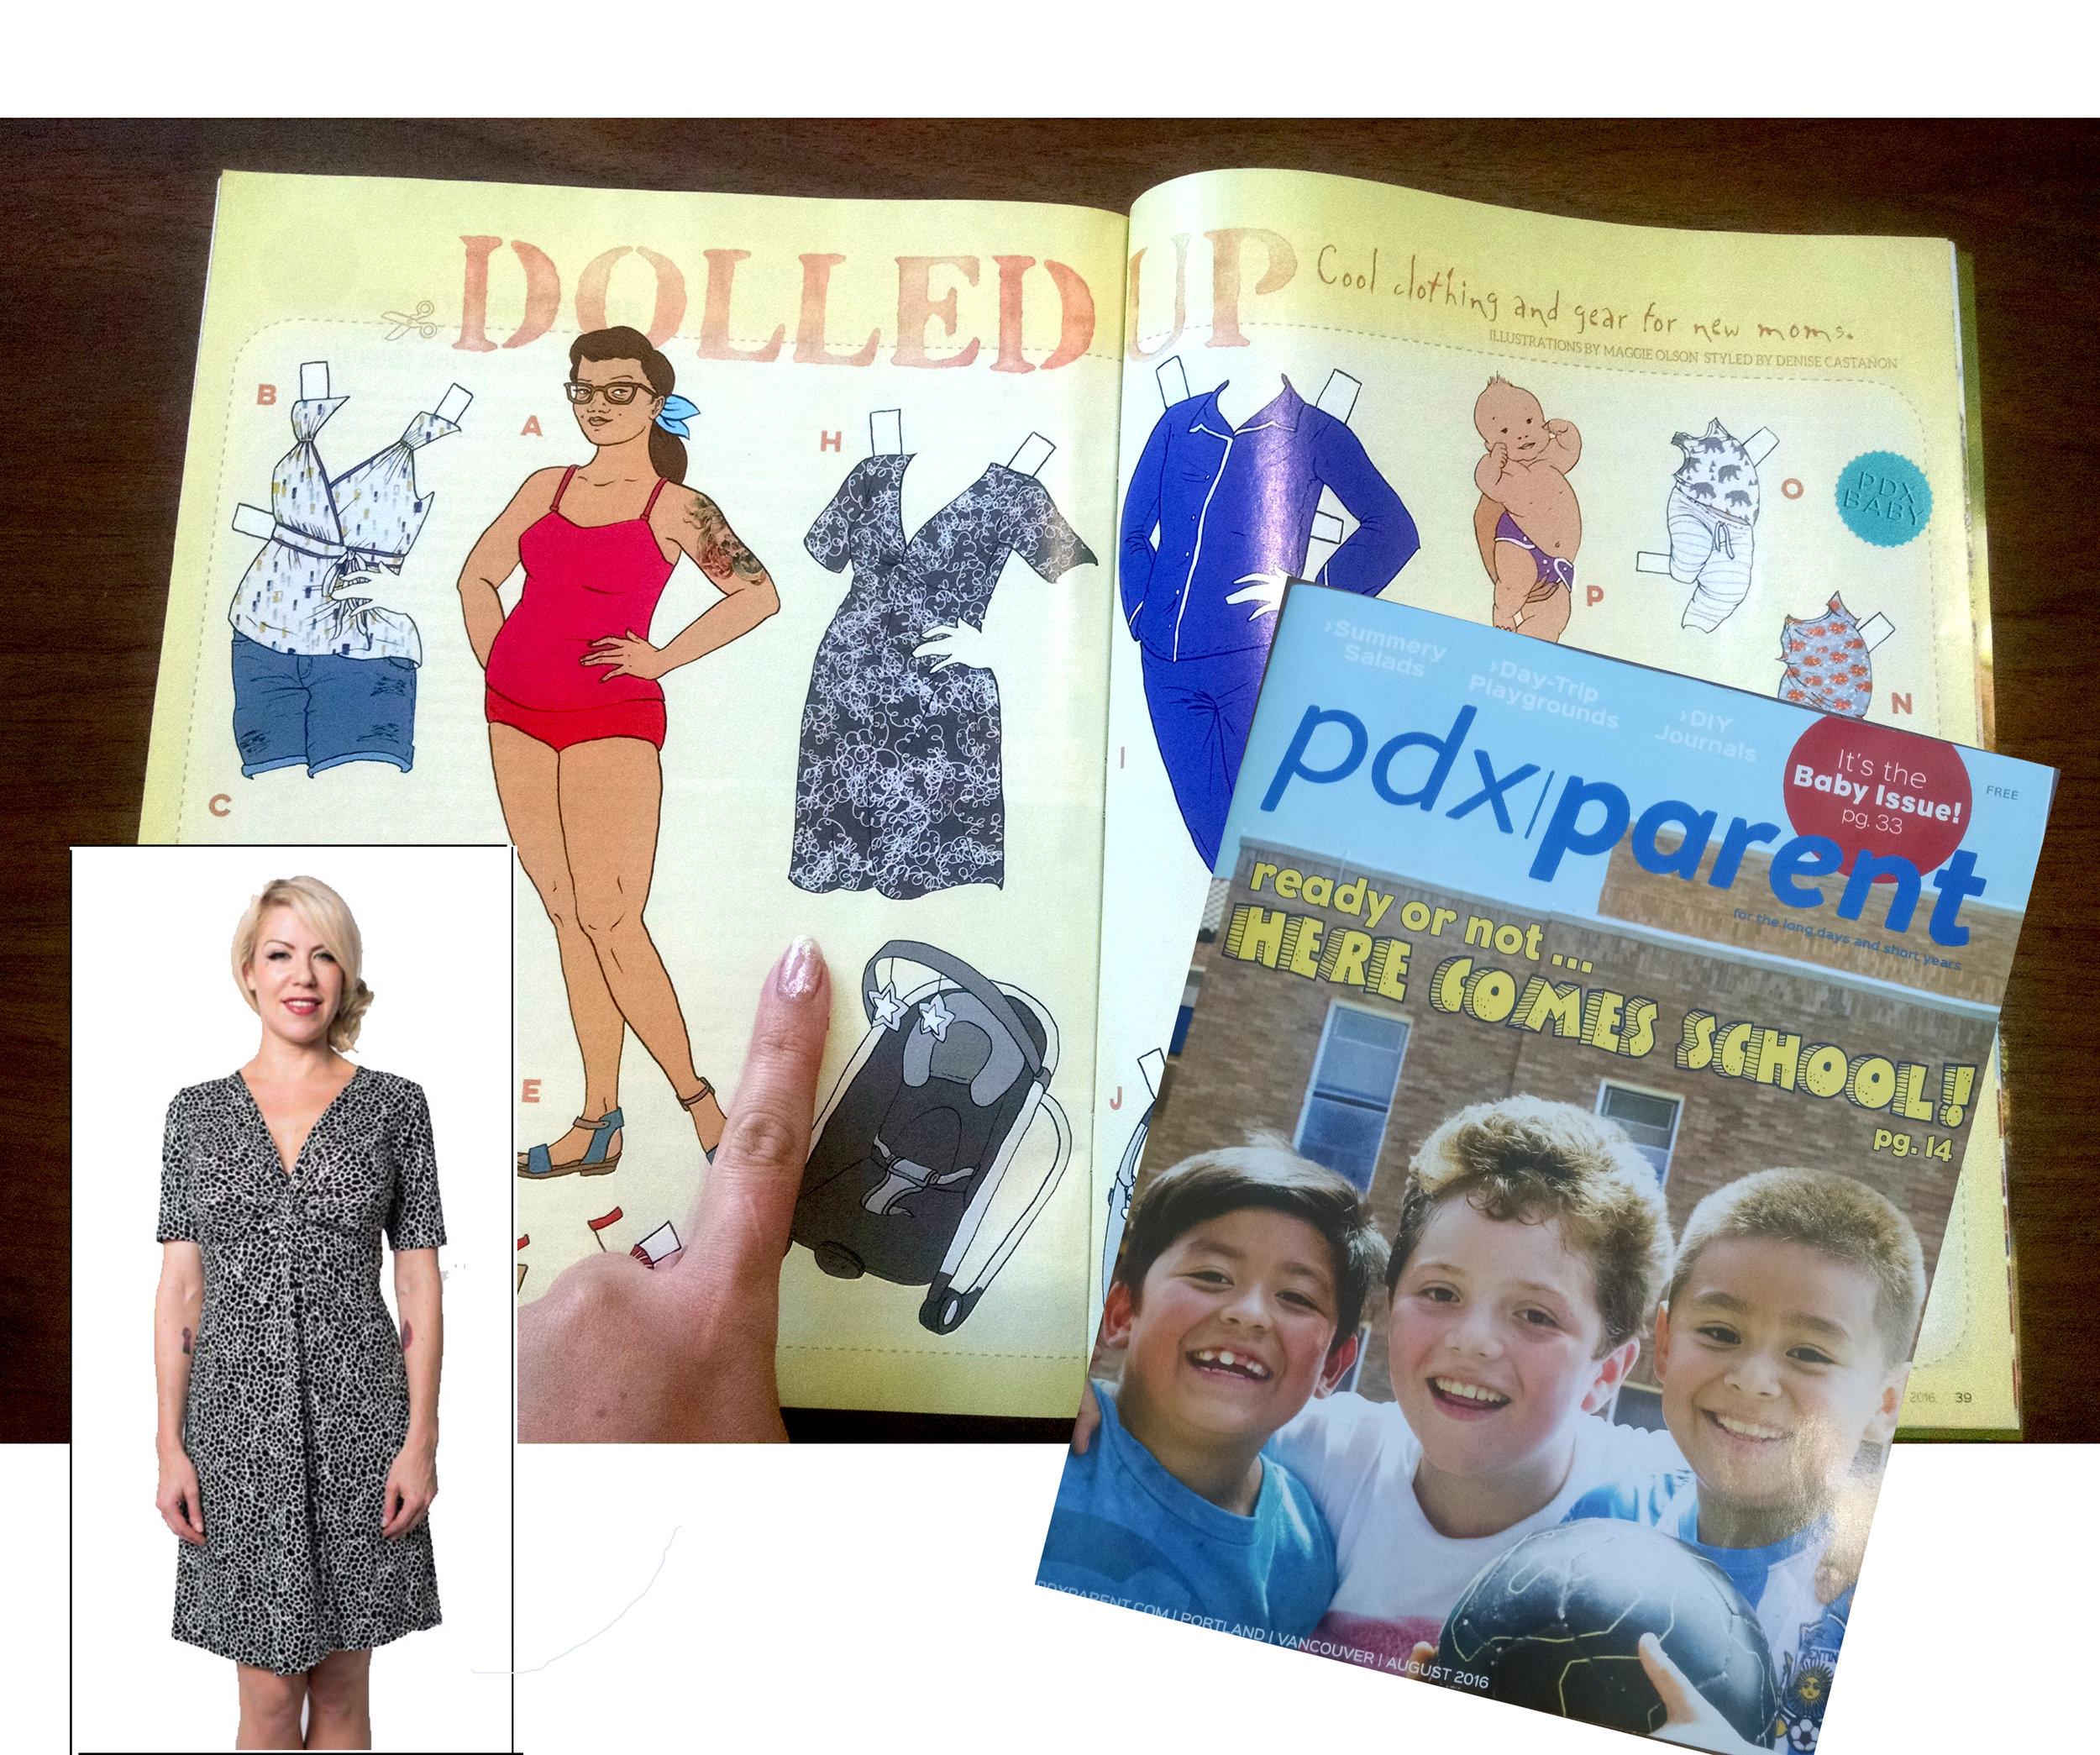 PDX Parent - August 2016  (shop featured, dress made by  Hubris Apparel )